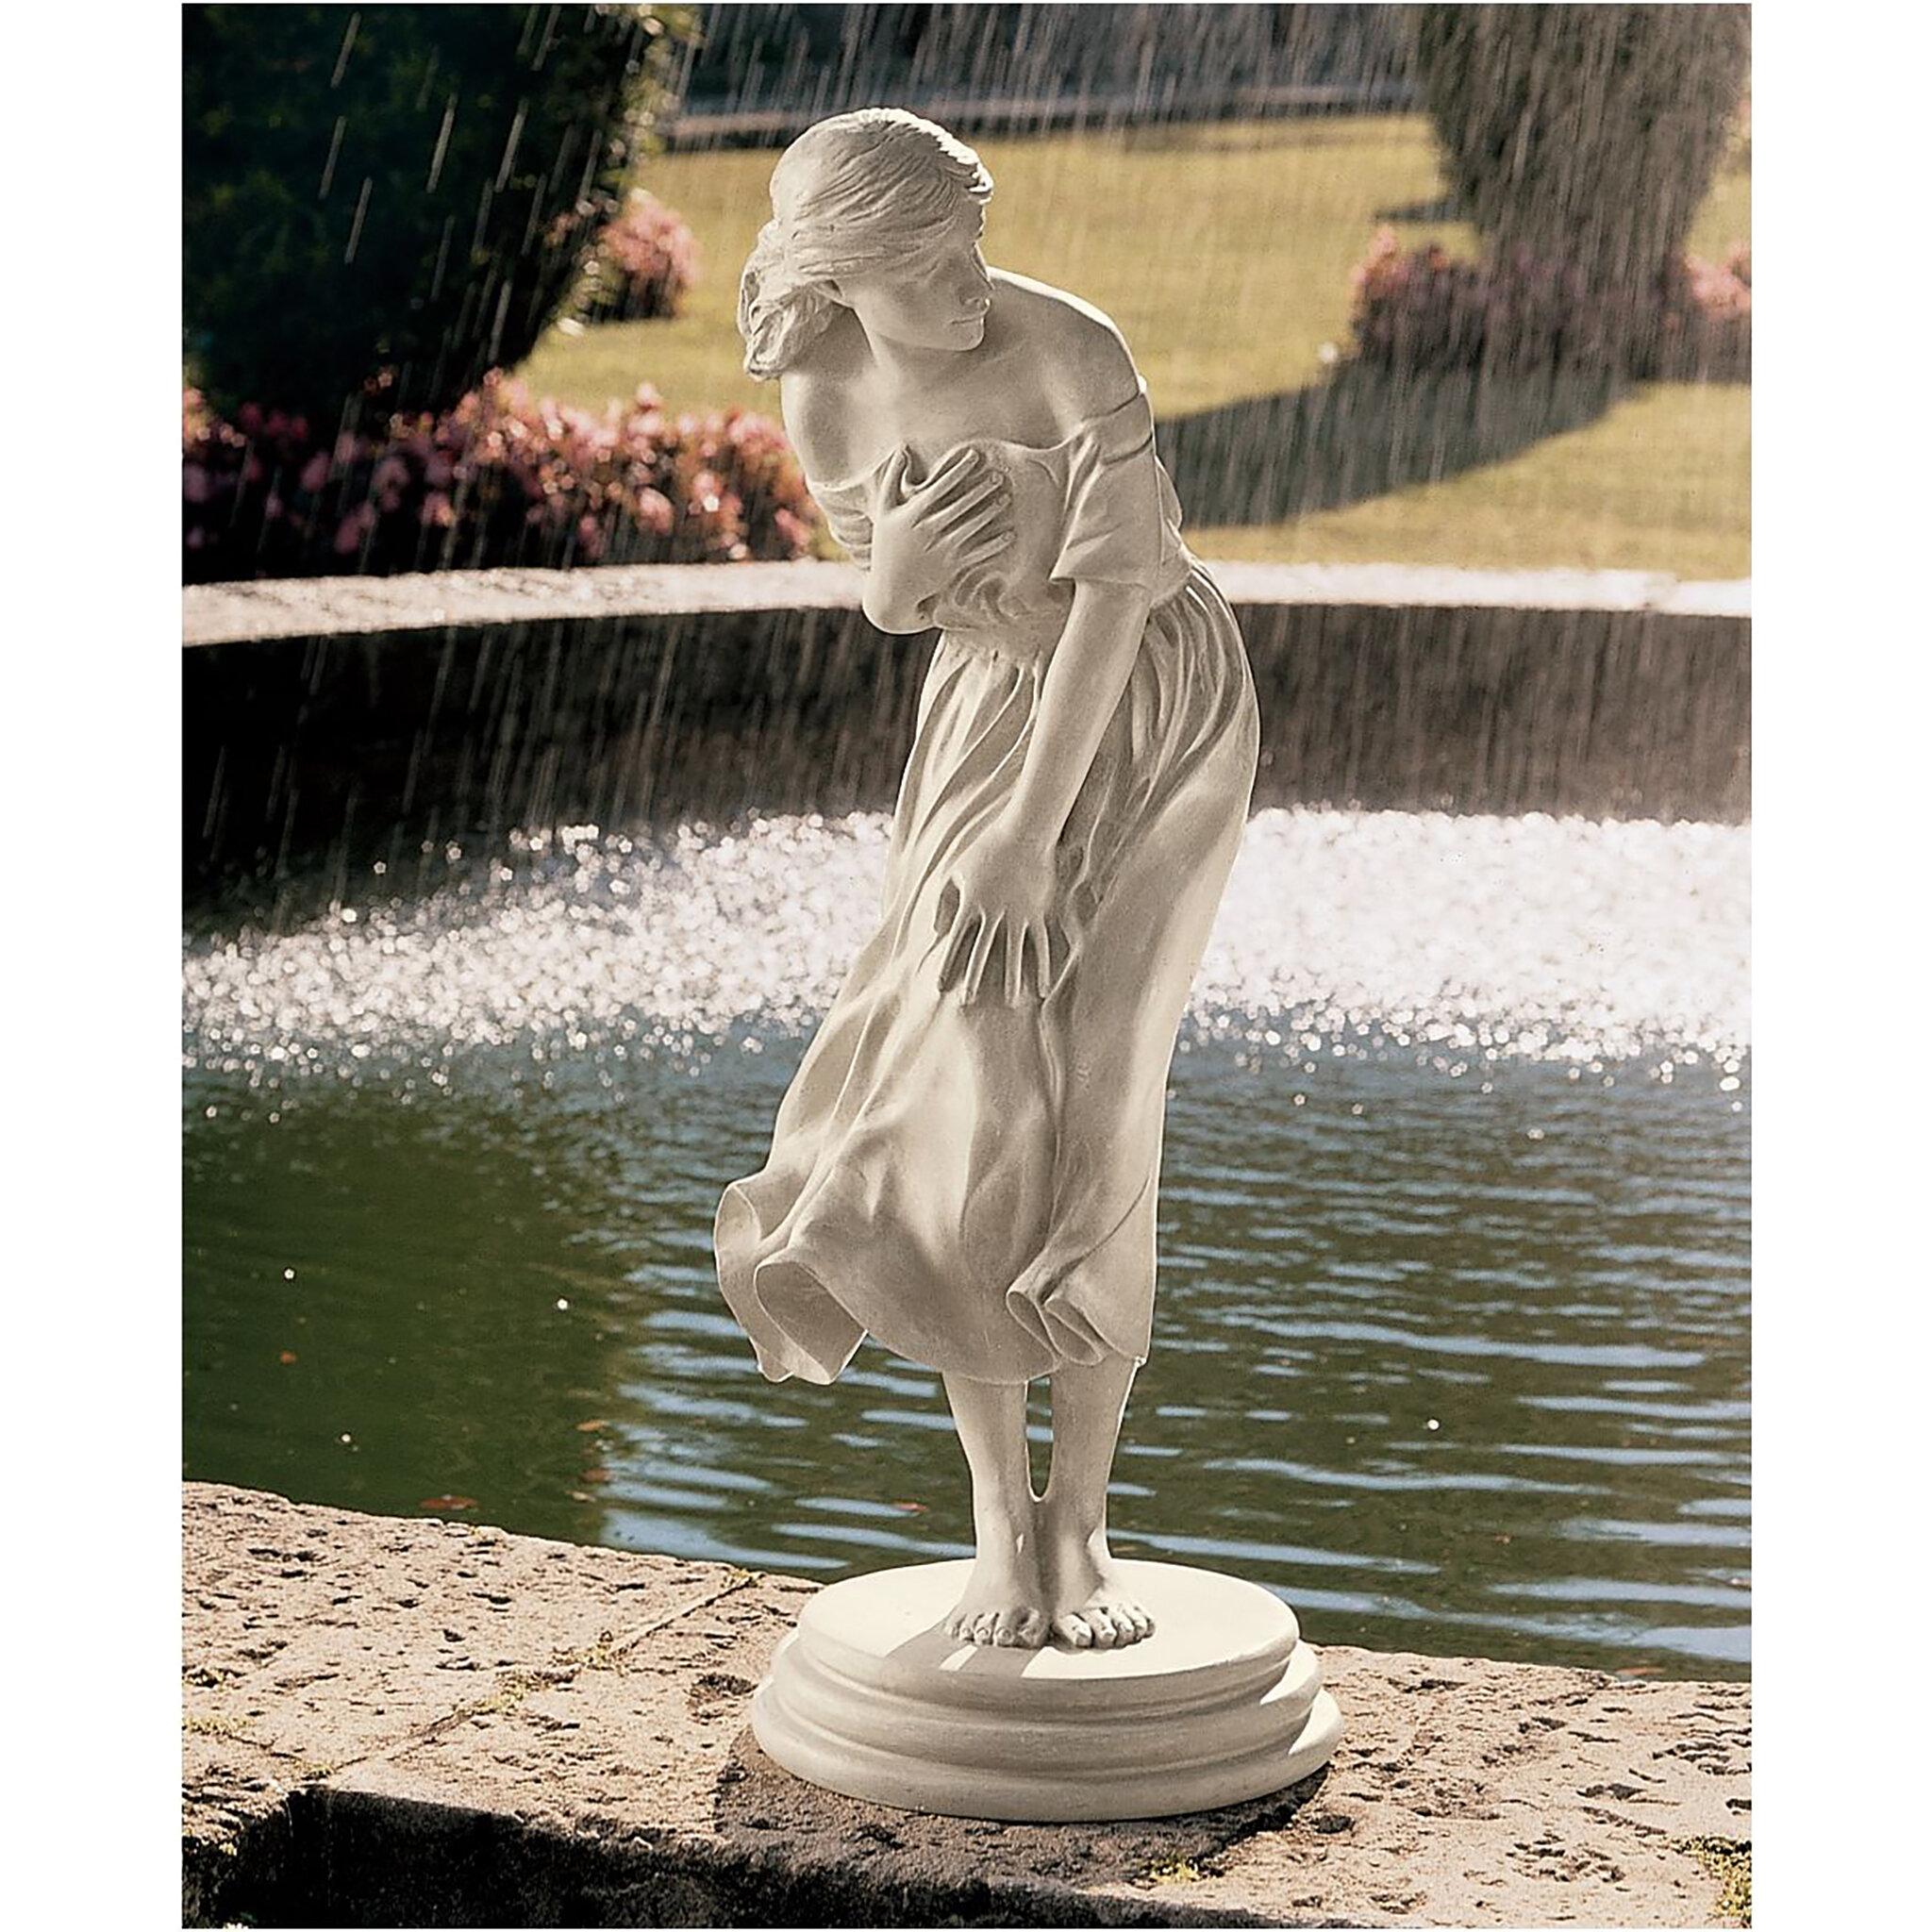 https://secure.img1-fg.wfcdn.com/im/71734164/compr-r85/5844/58448469/windblown-statue.jpg